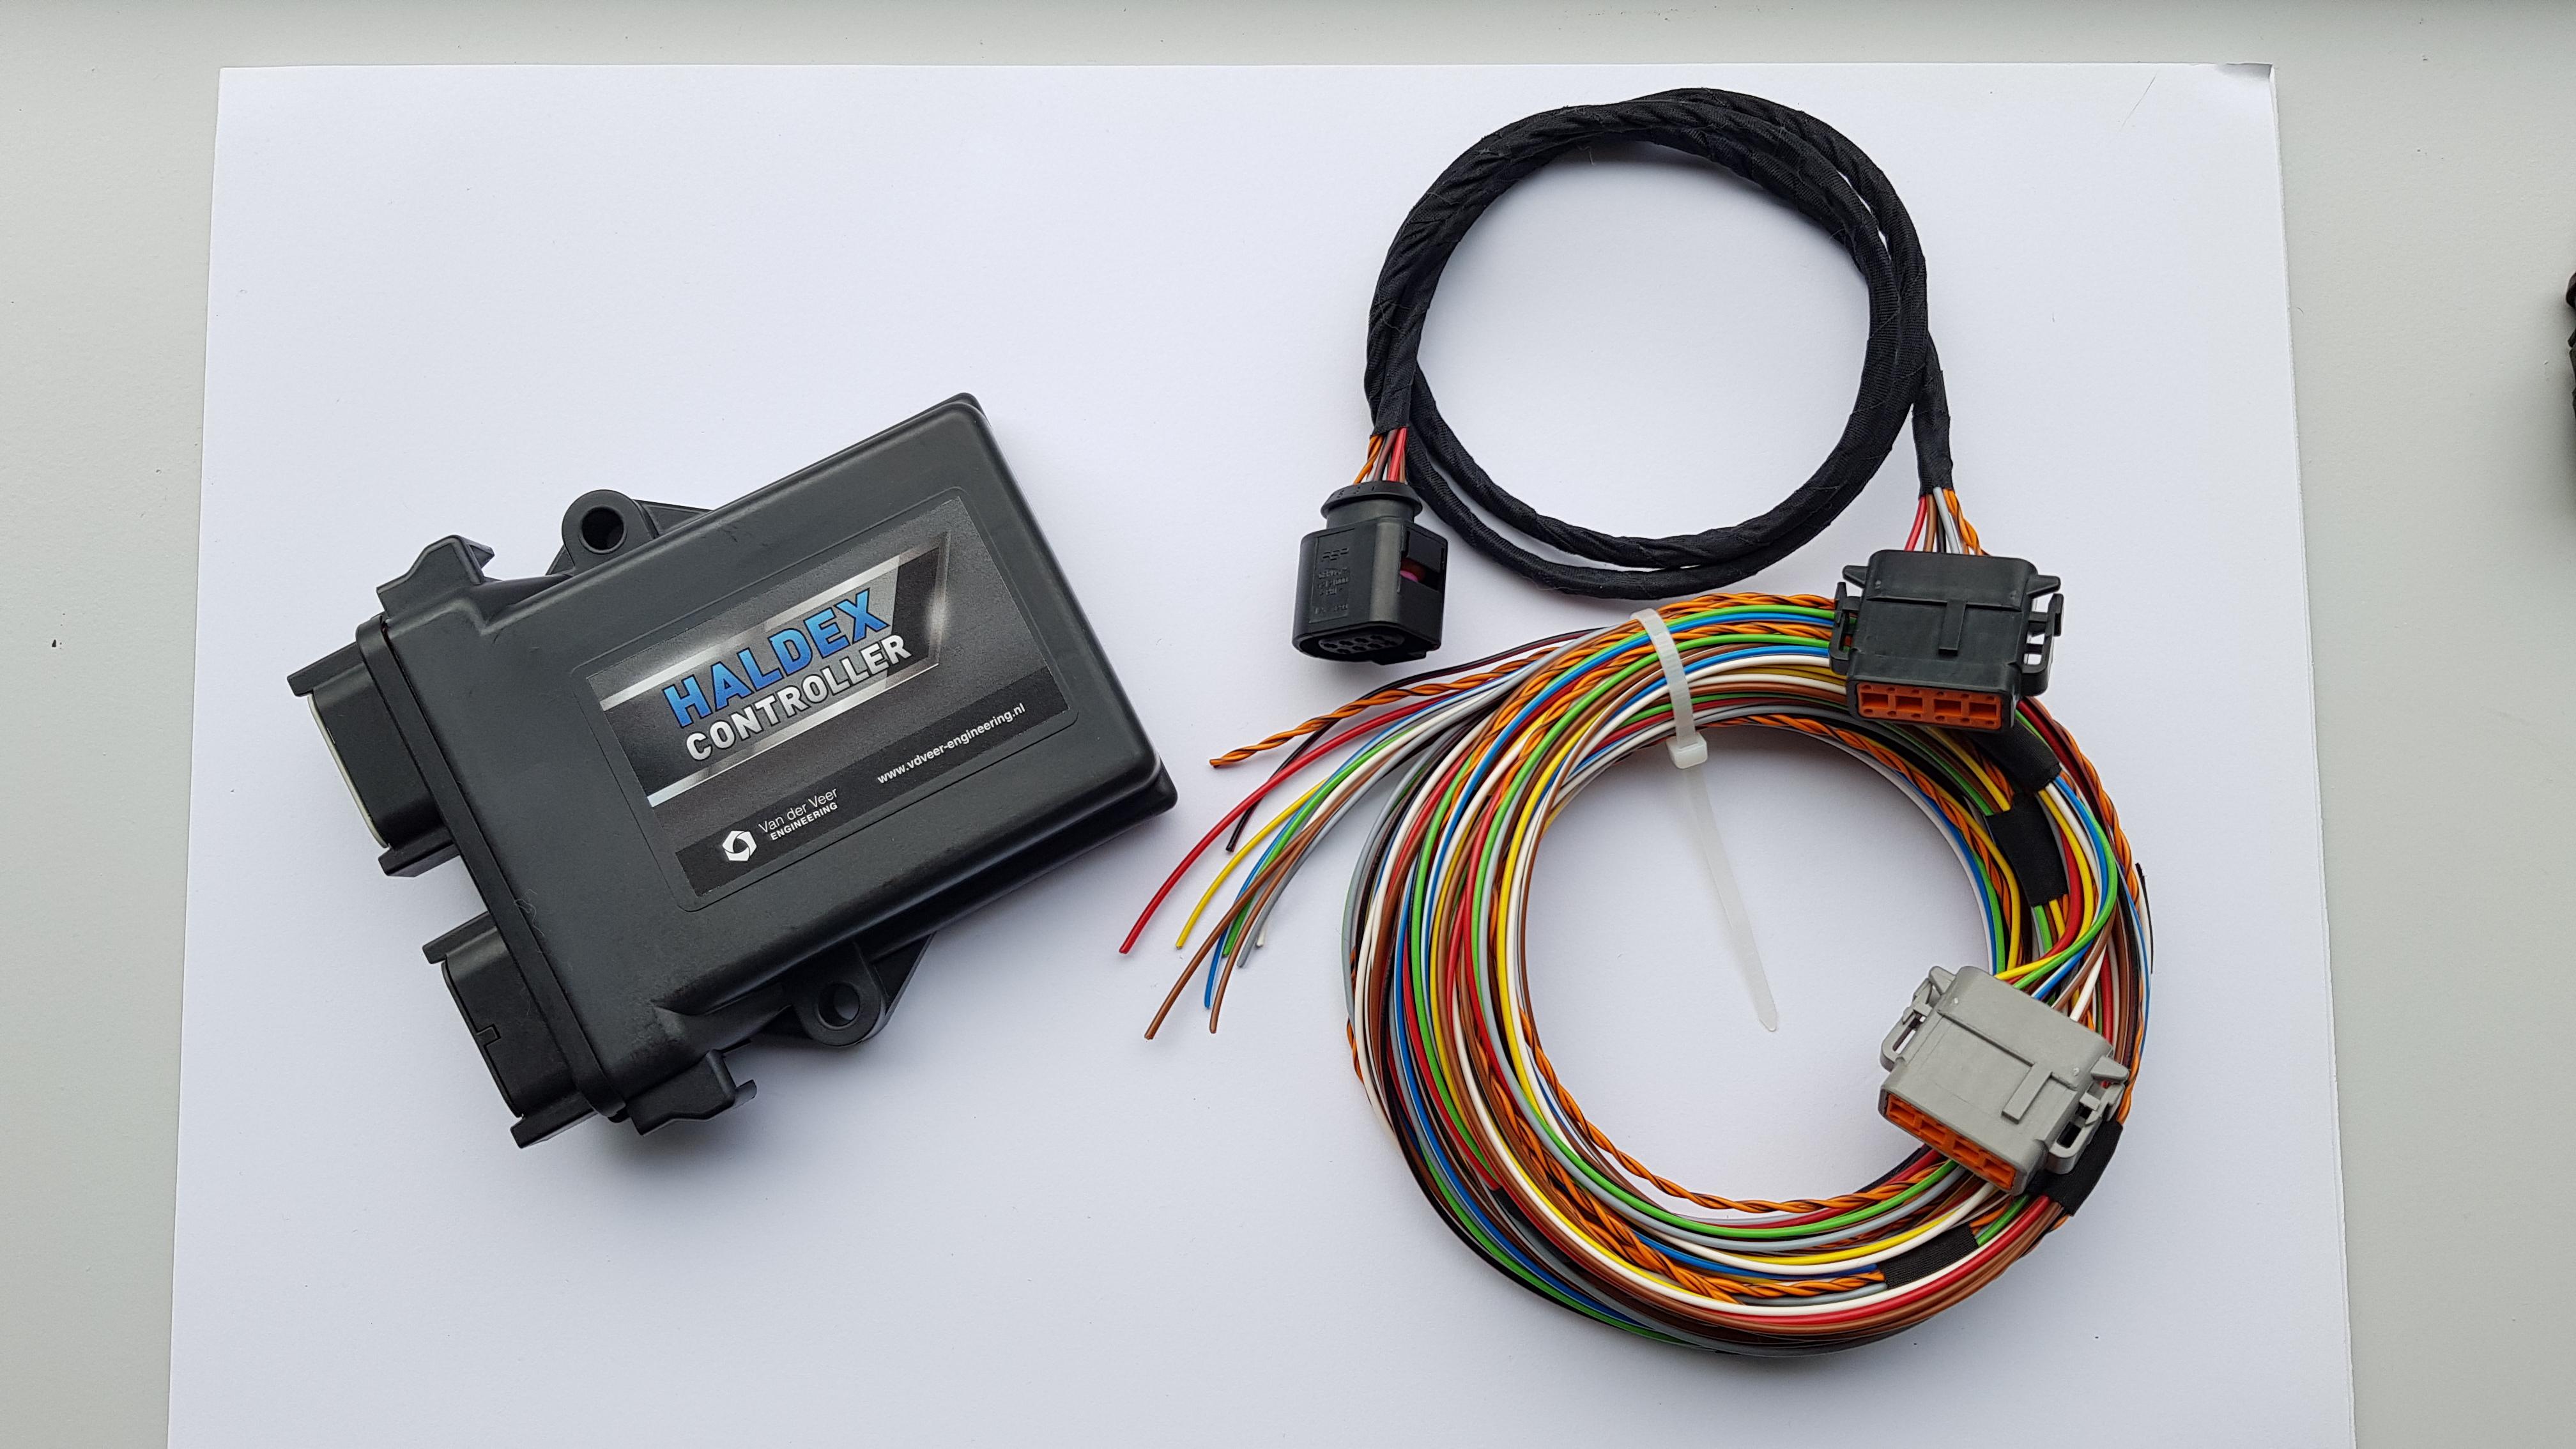 Haldex Controller Gen1 to Gen4 Standalone